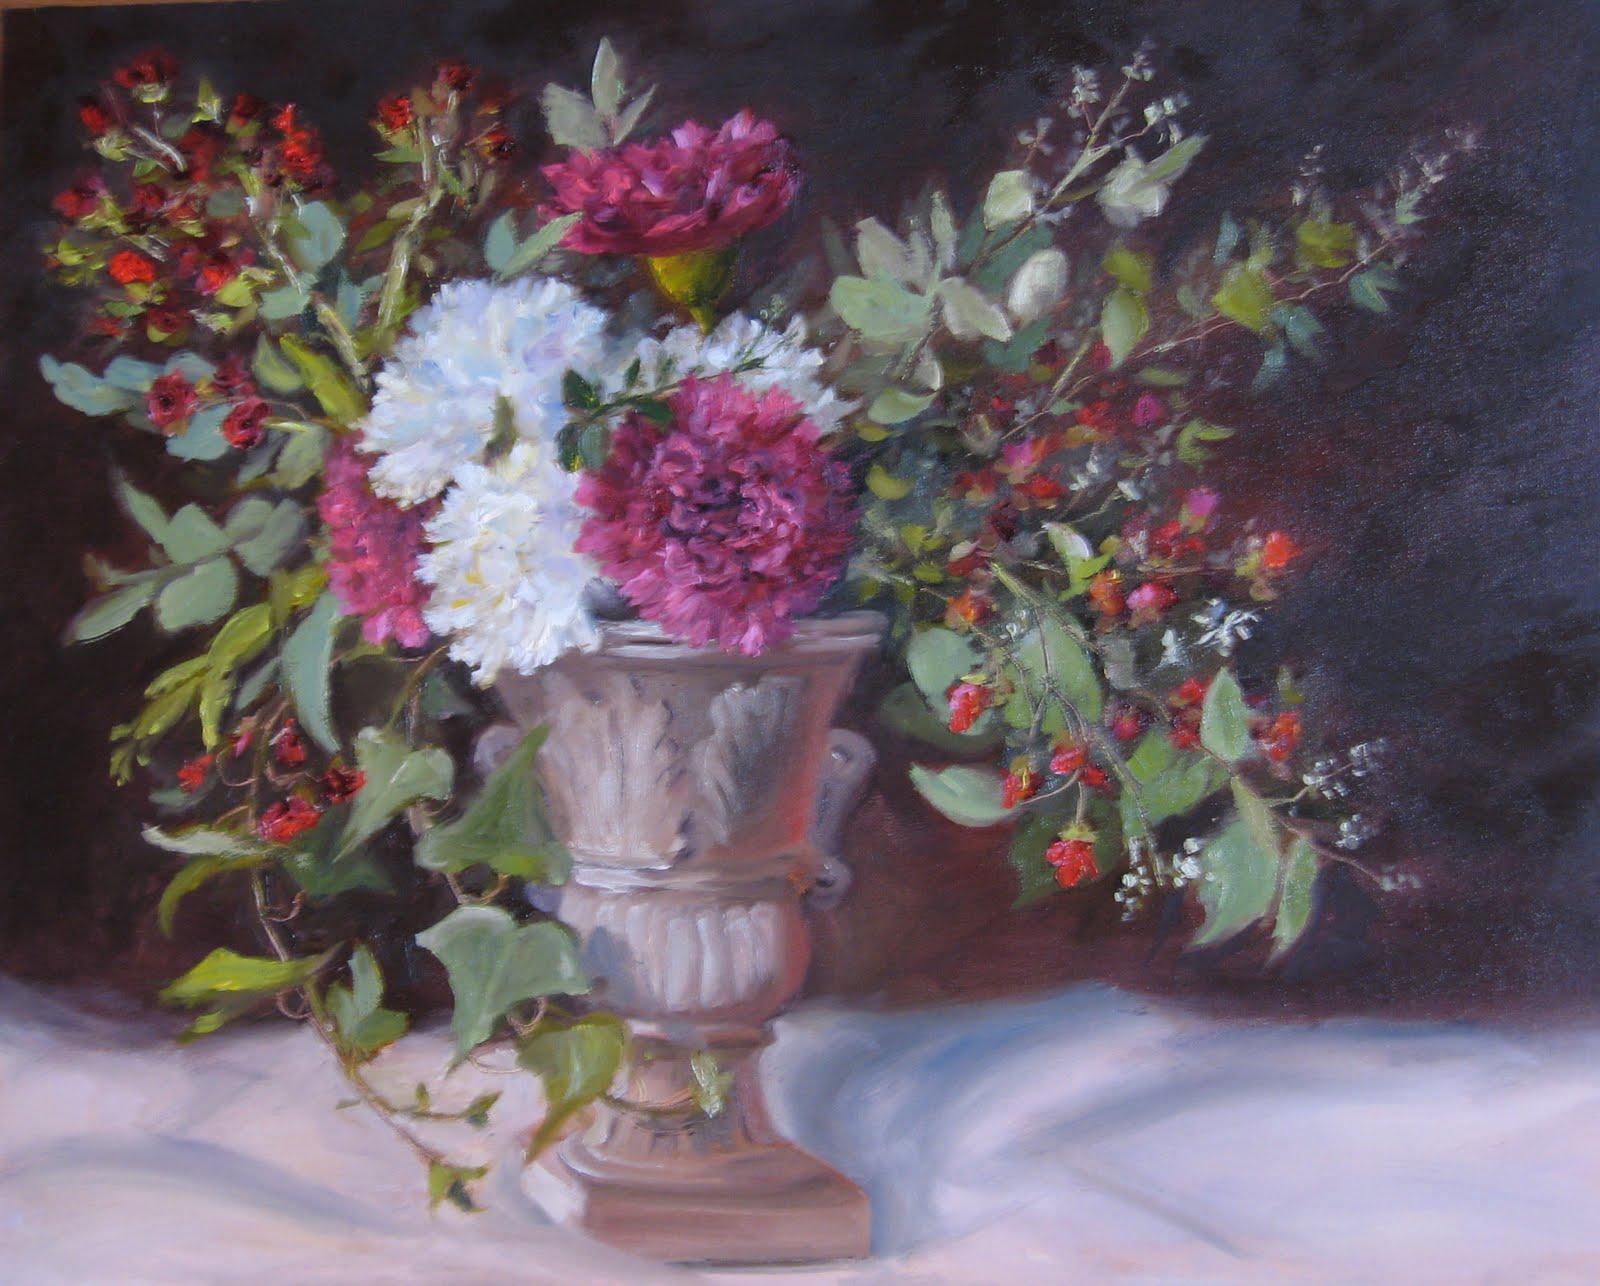 """Flower Study #28- More Complex Floral Design-Classic Urn"" original fine art by Pat Fiorello"